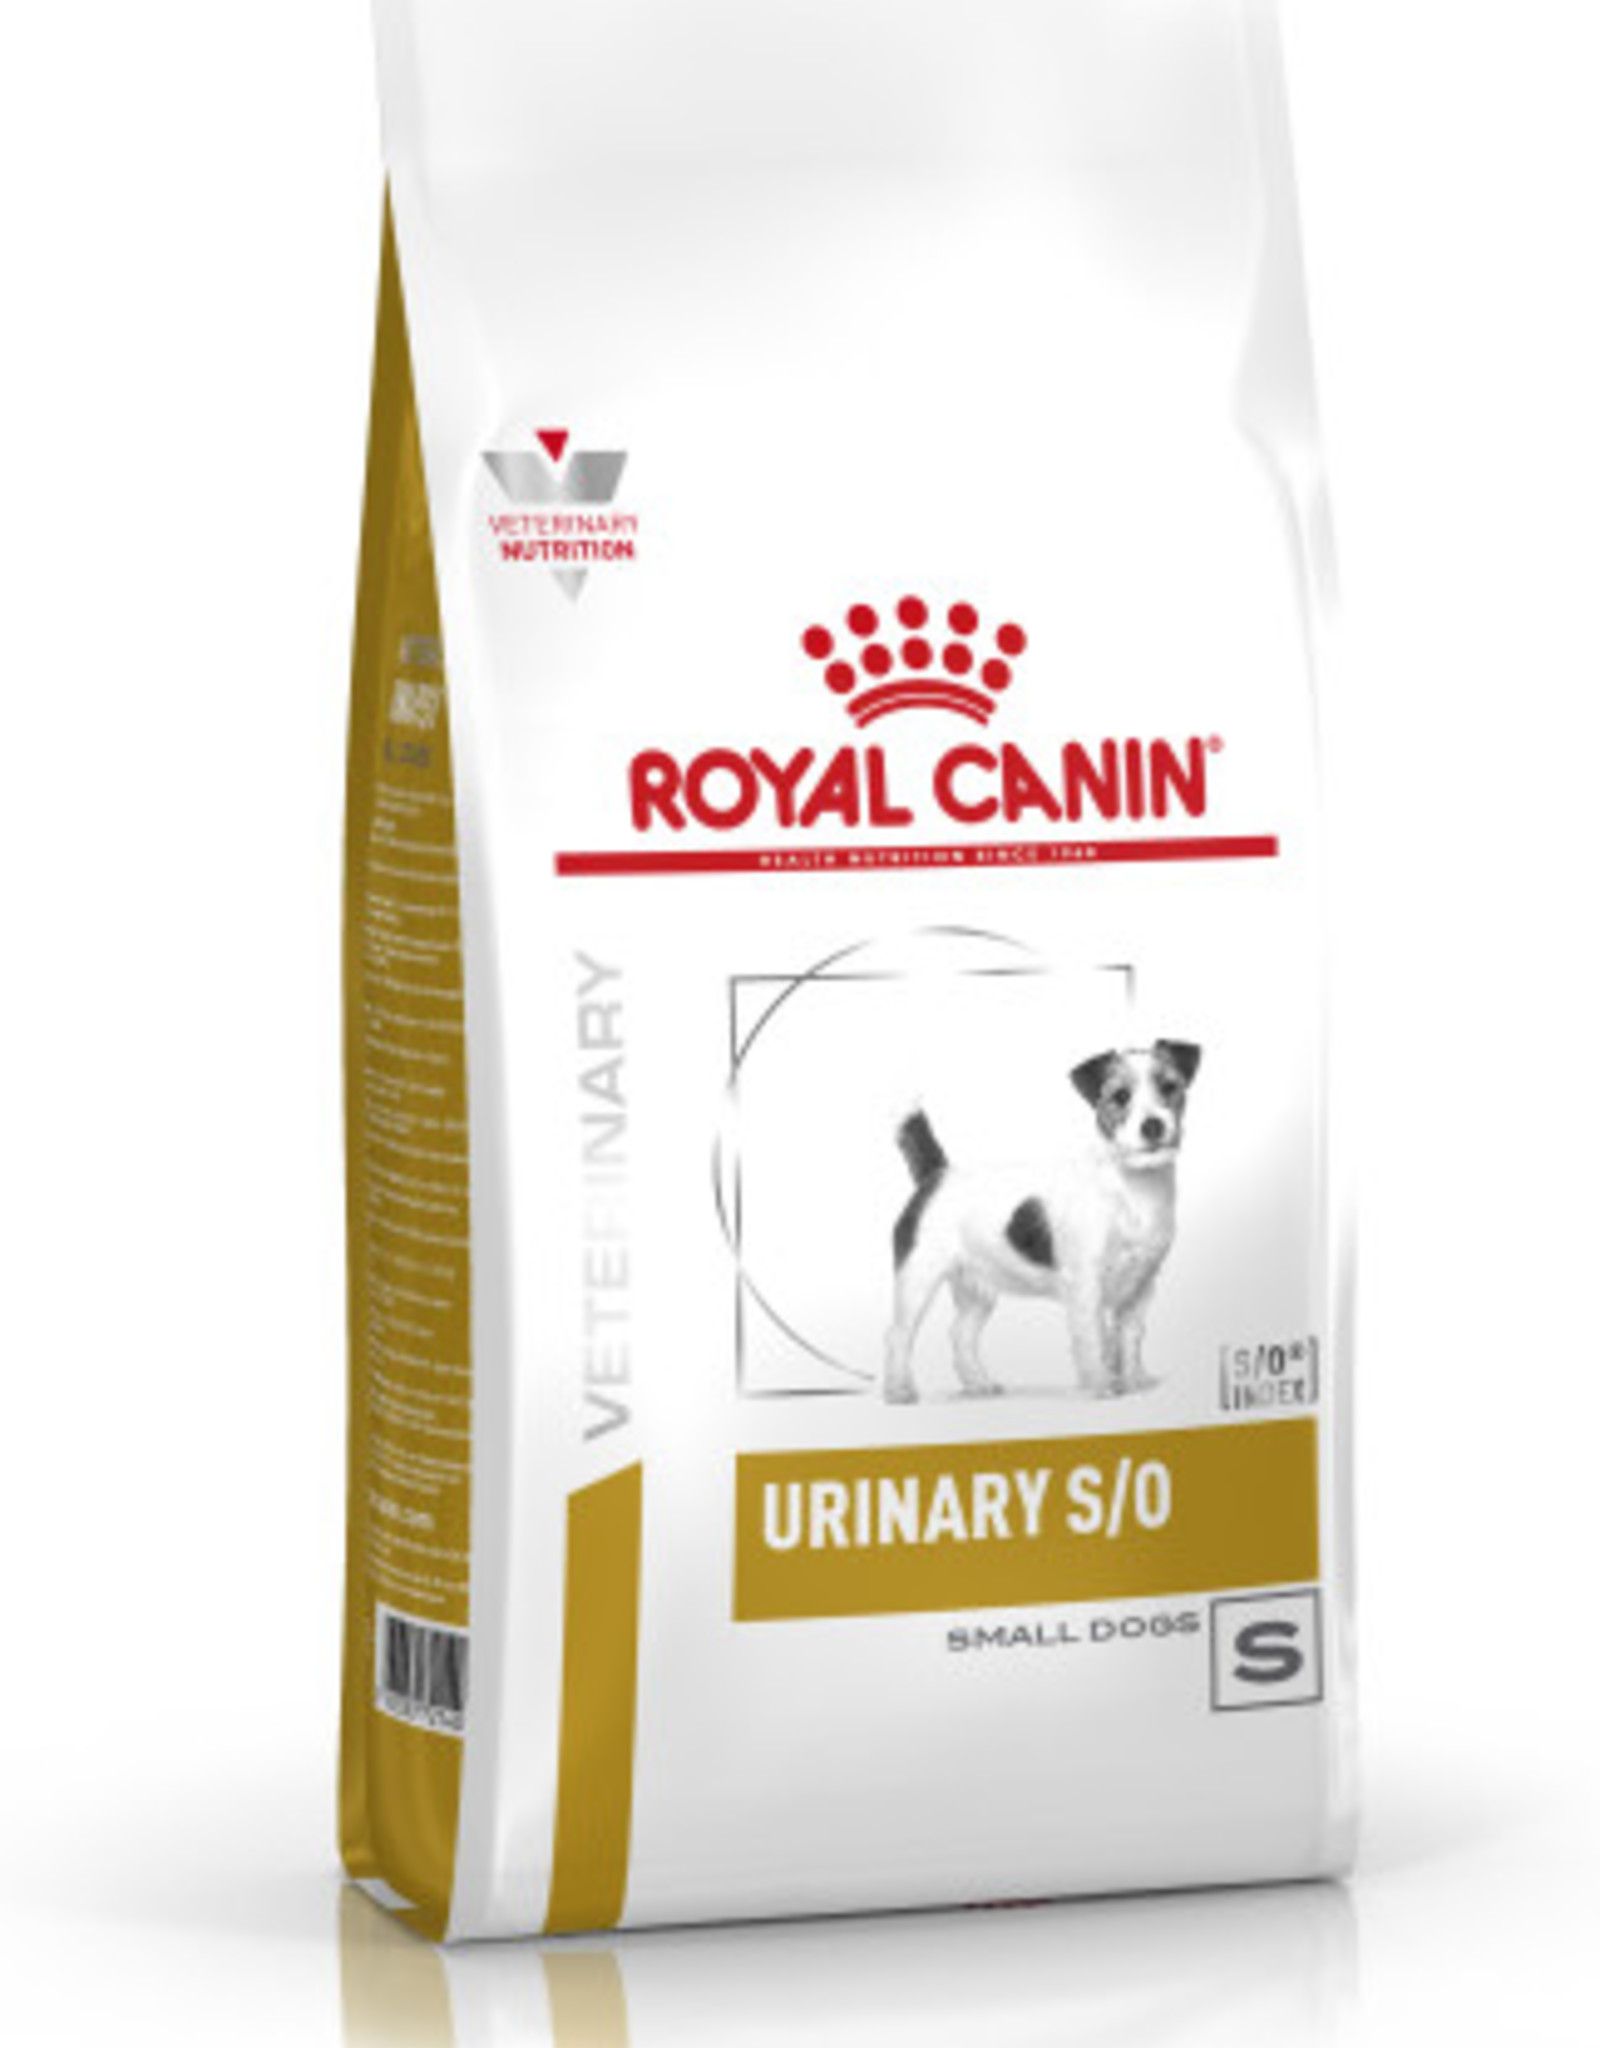 Royal Canin Royal Canin Urinary S/o Small Hond 1,5kg